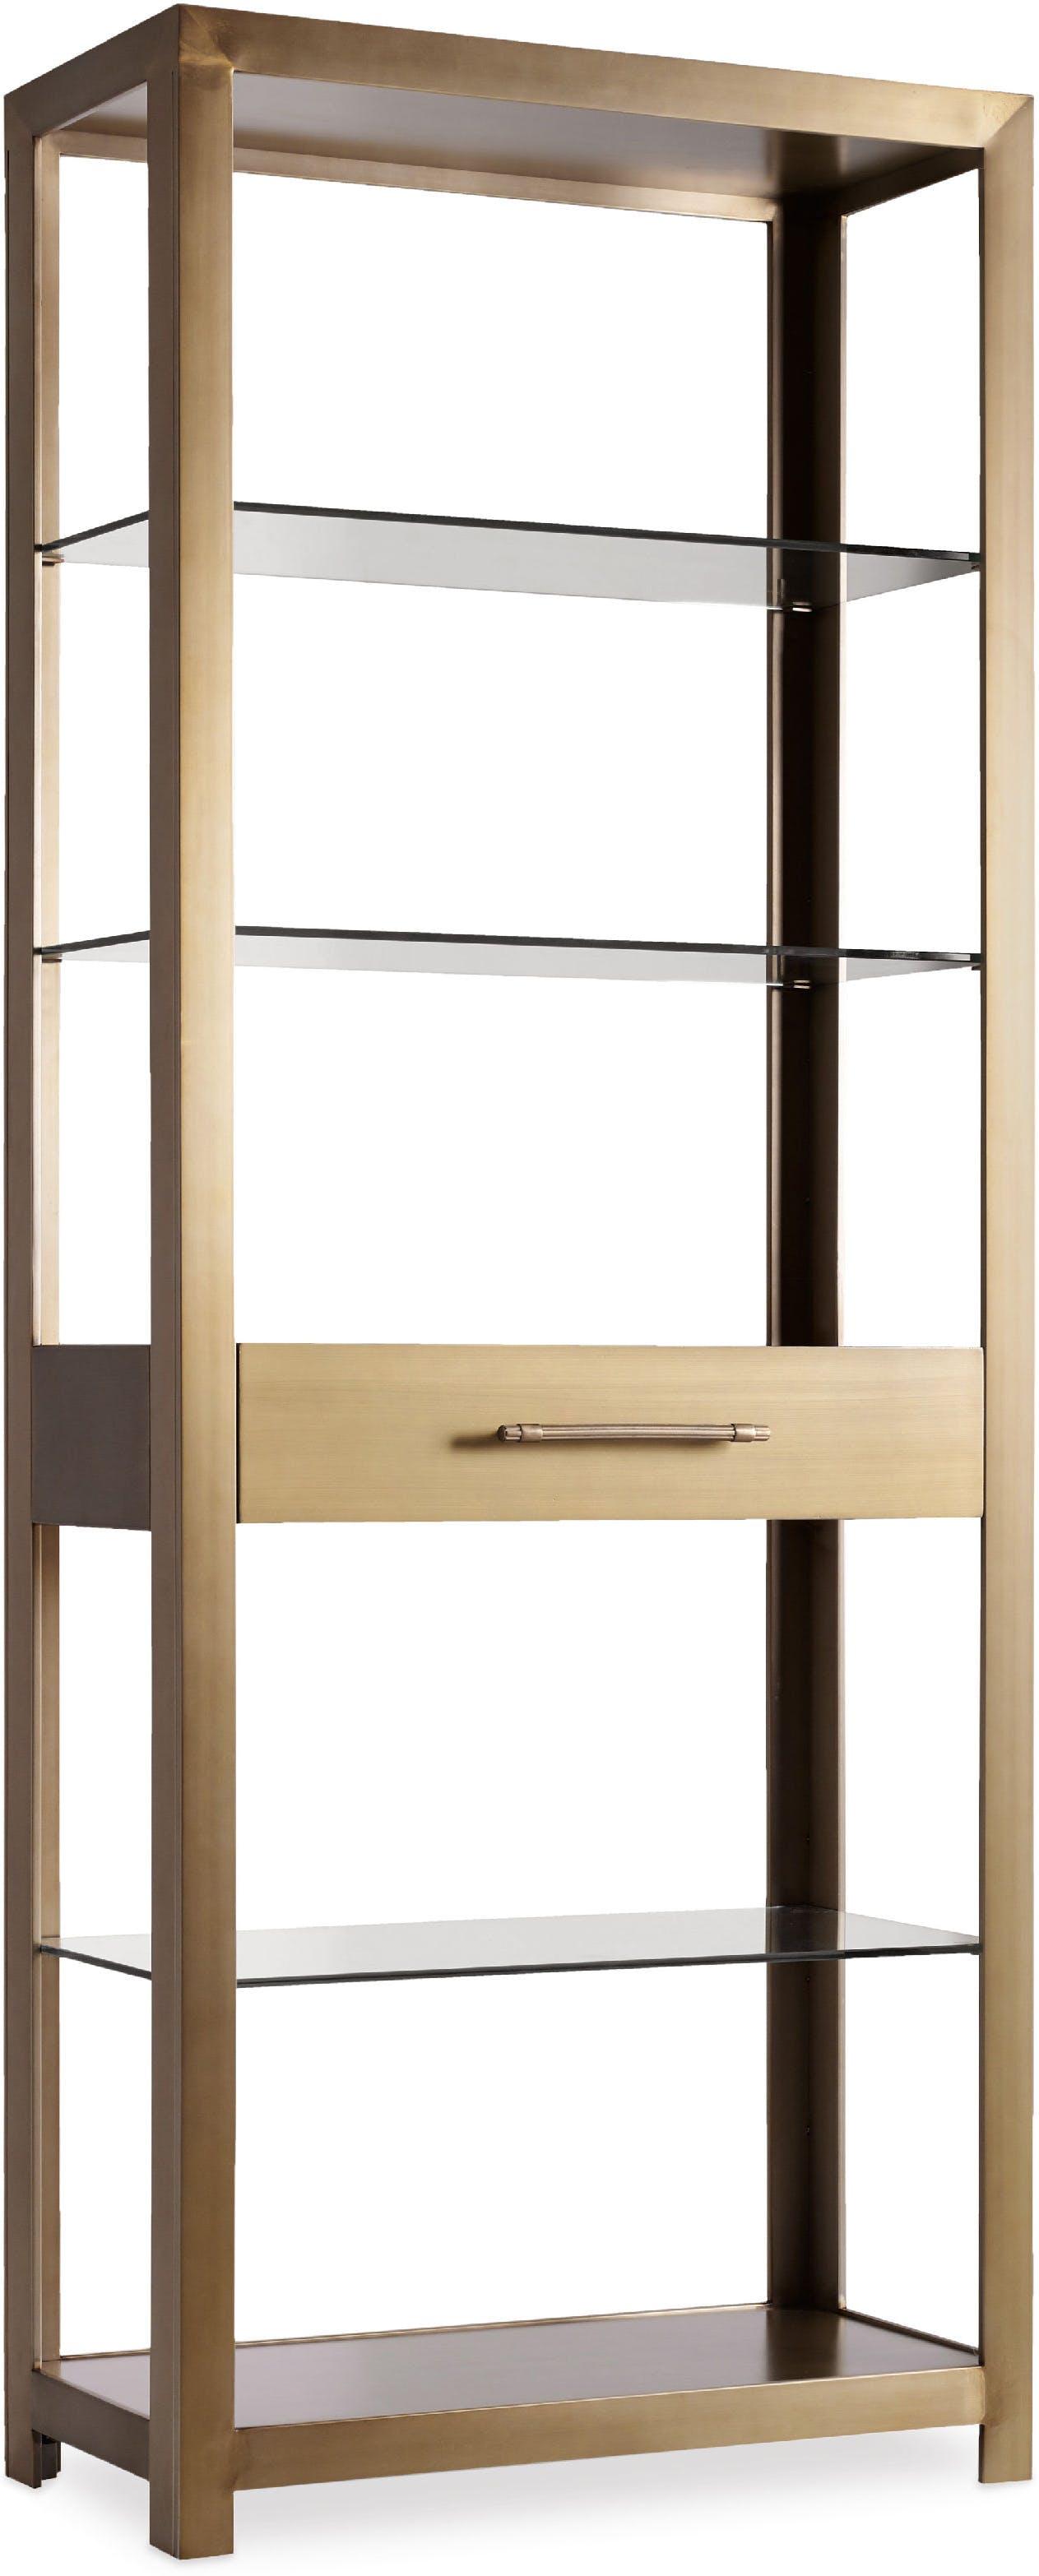 Matthews Interiors - Office Furniture - Hooker 1600-10445-mtl1-silo.jpg